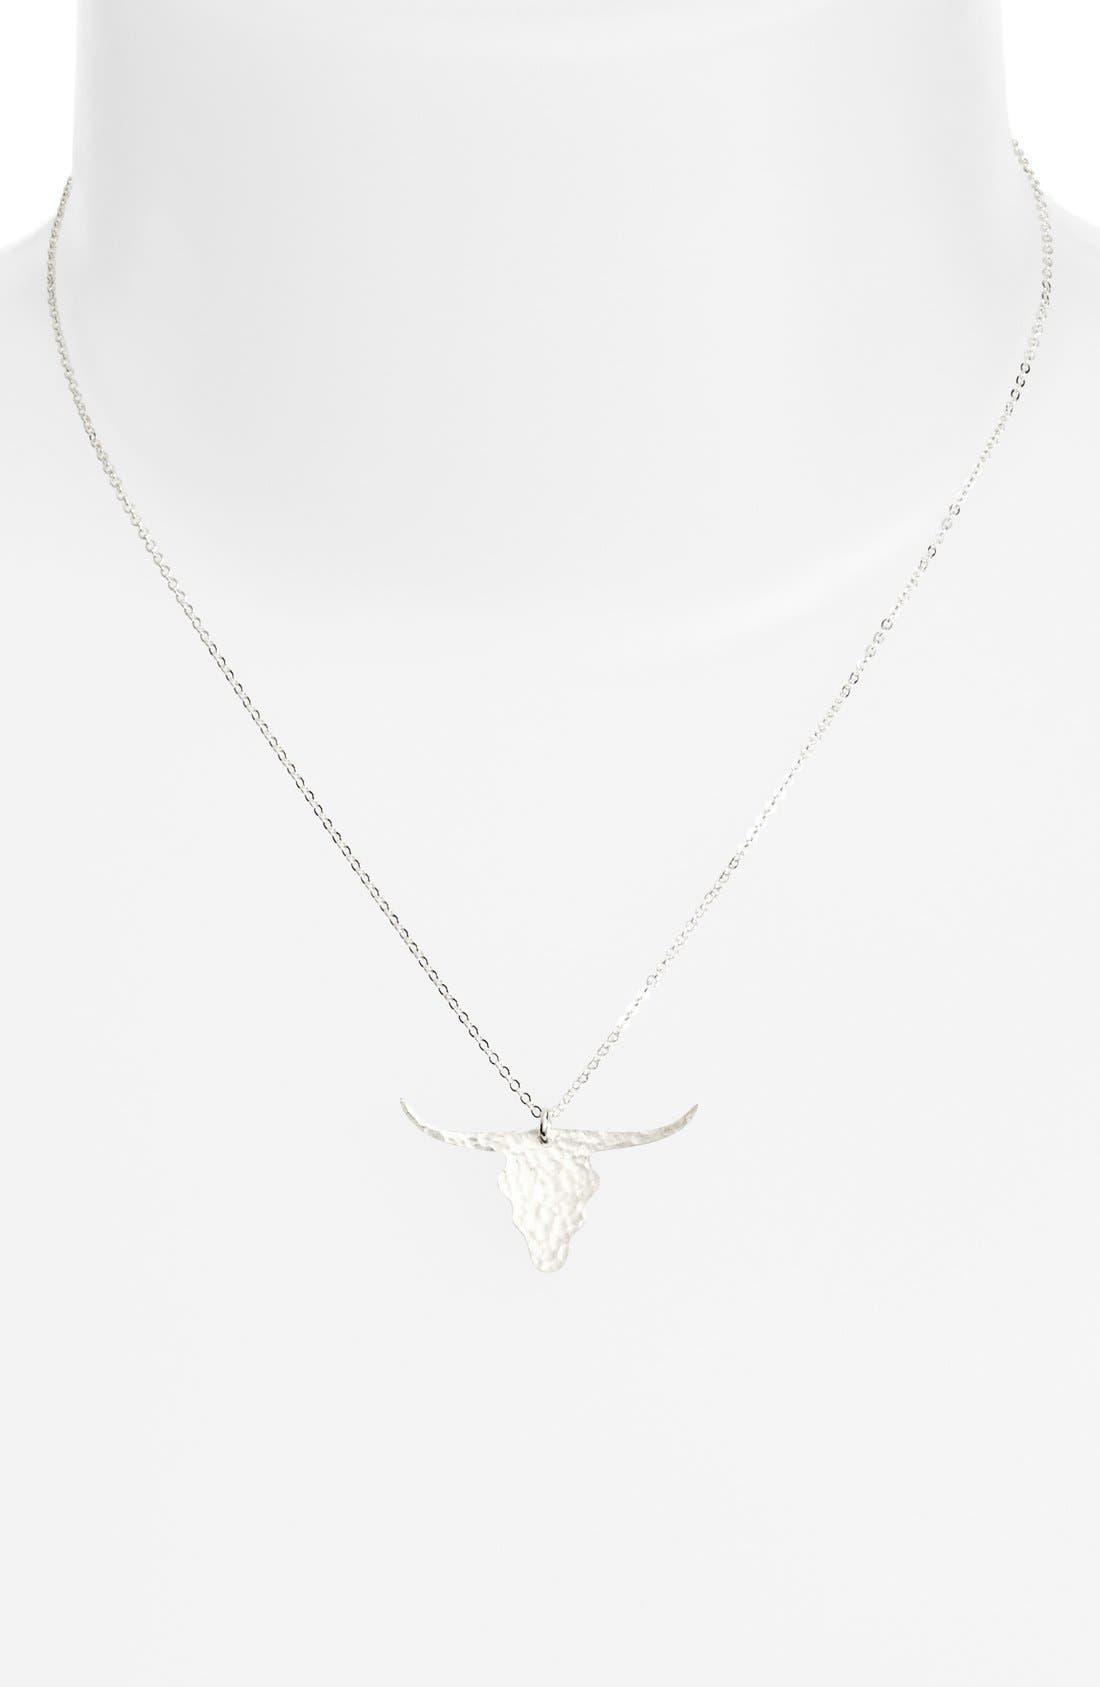 Alternate Image 1 Selected - Nashelle Longhorn Pendant Necklace